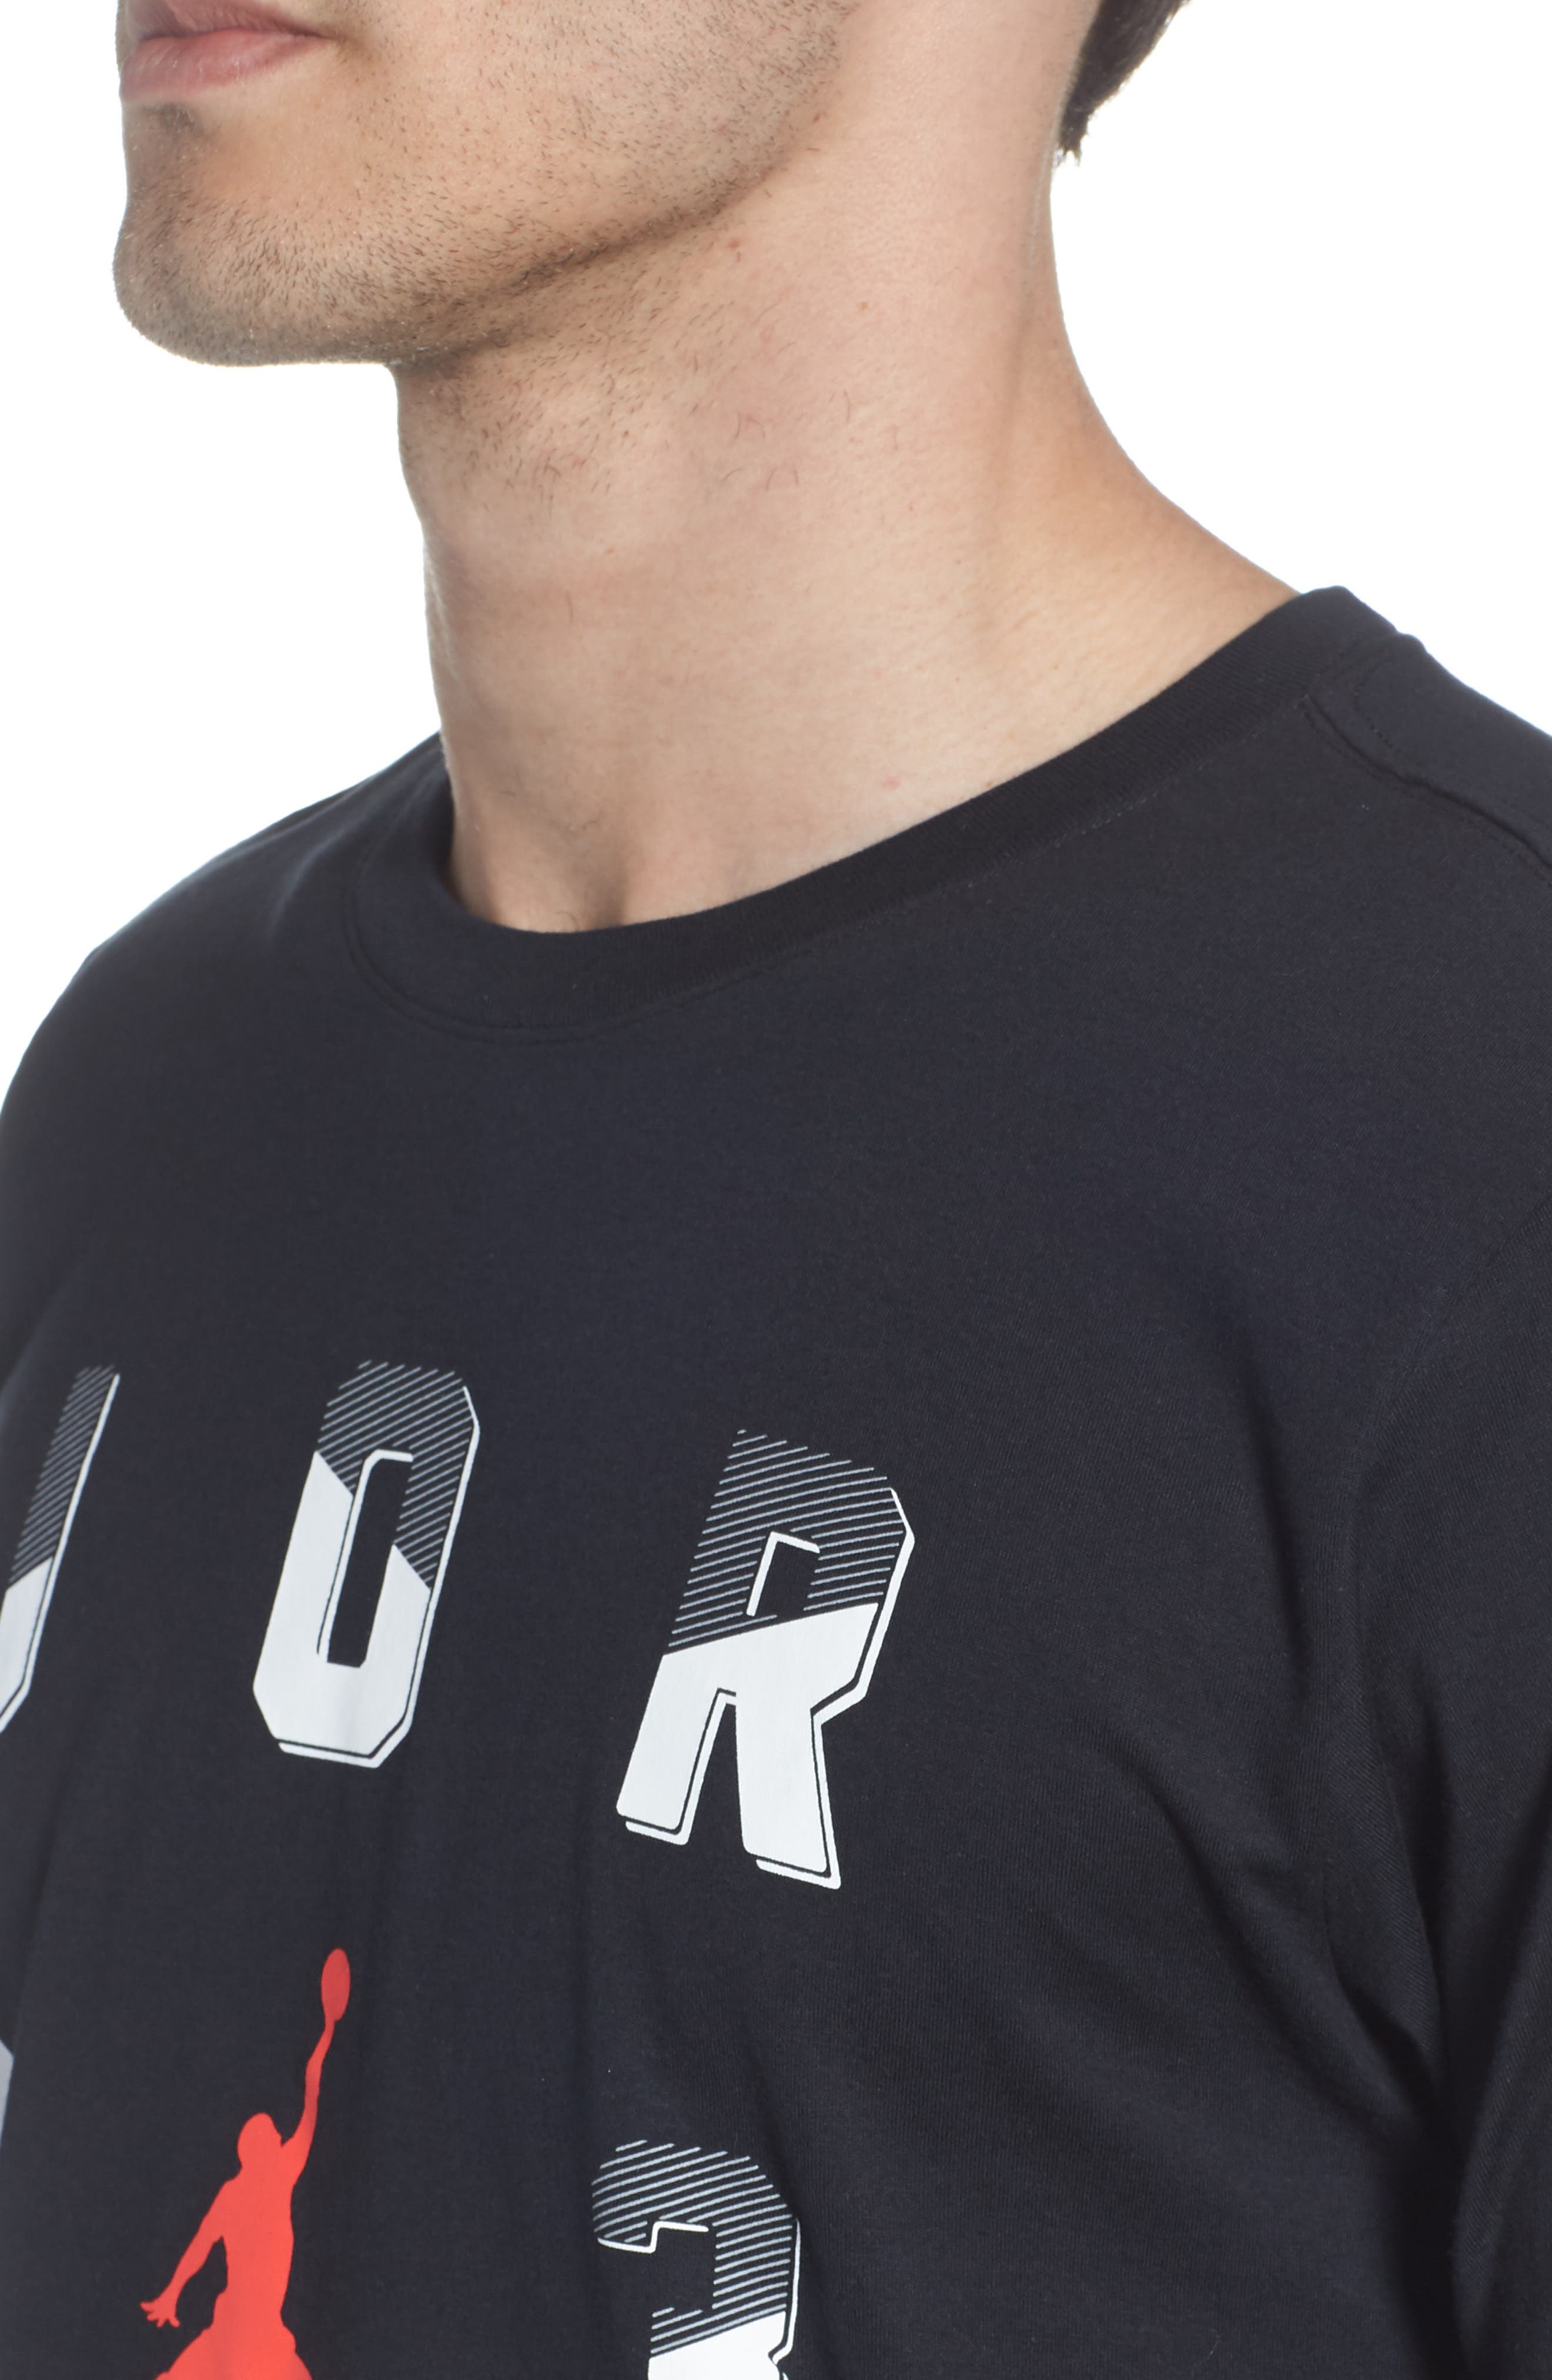 Sportswear 23 T-Shirt,                             Alternate thumbnail 4, color,                             BLACK/ INFRARED 23